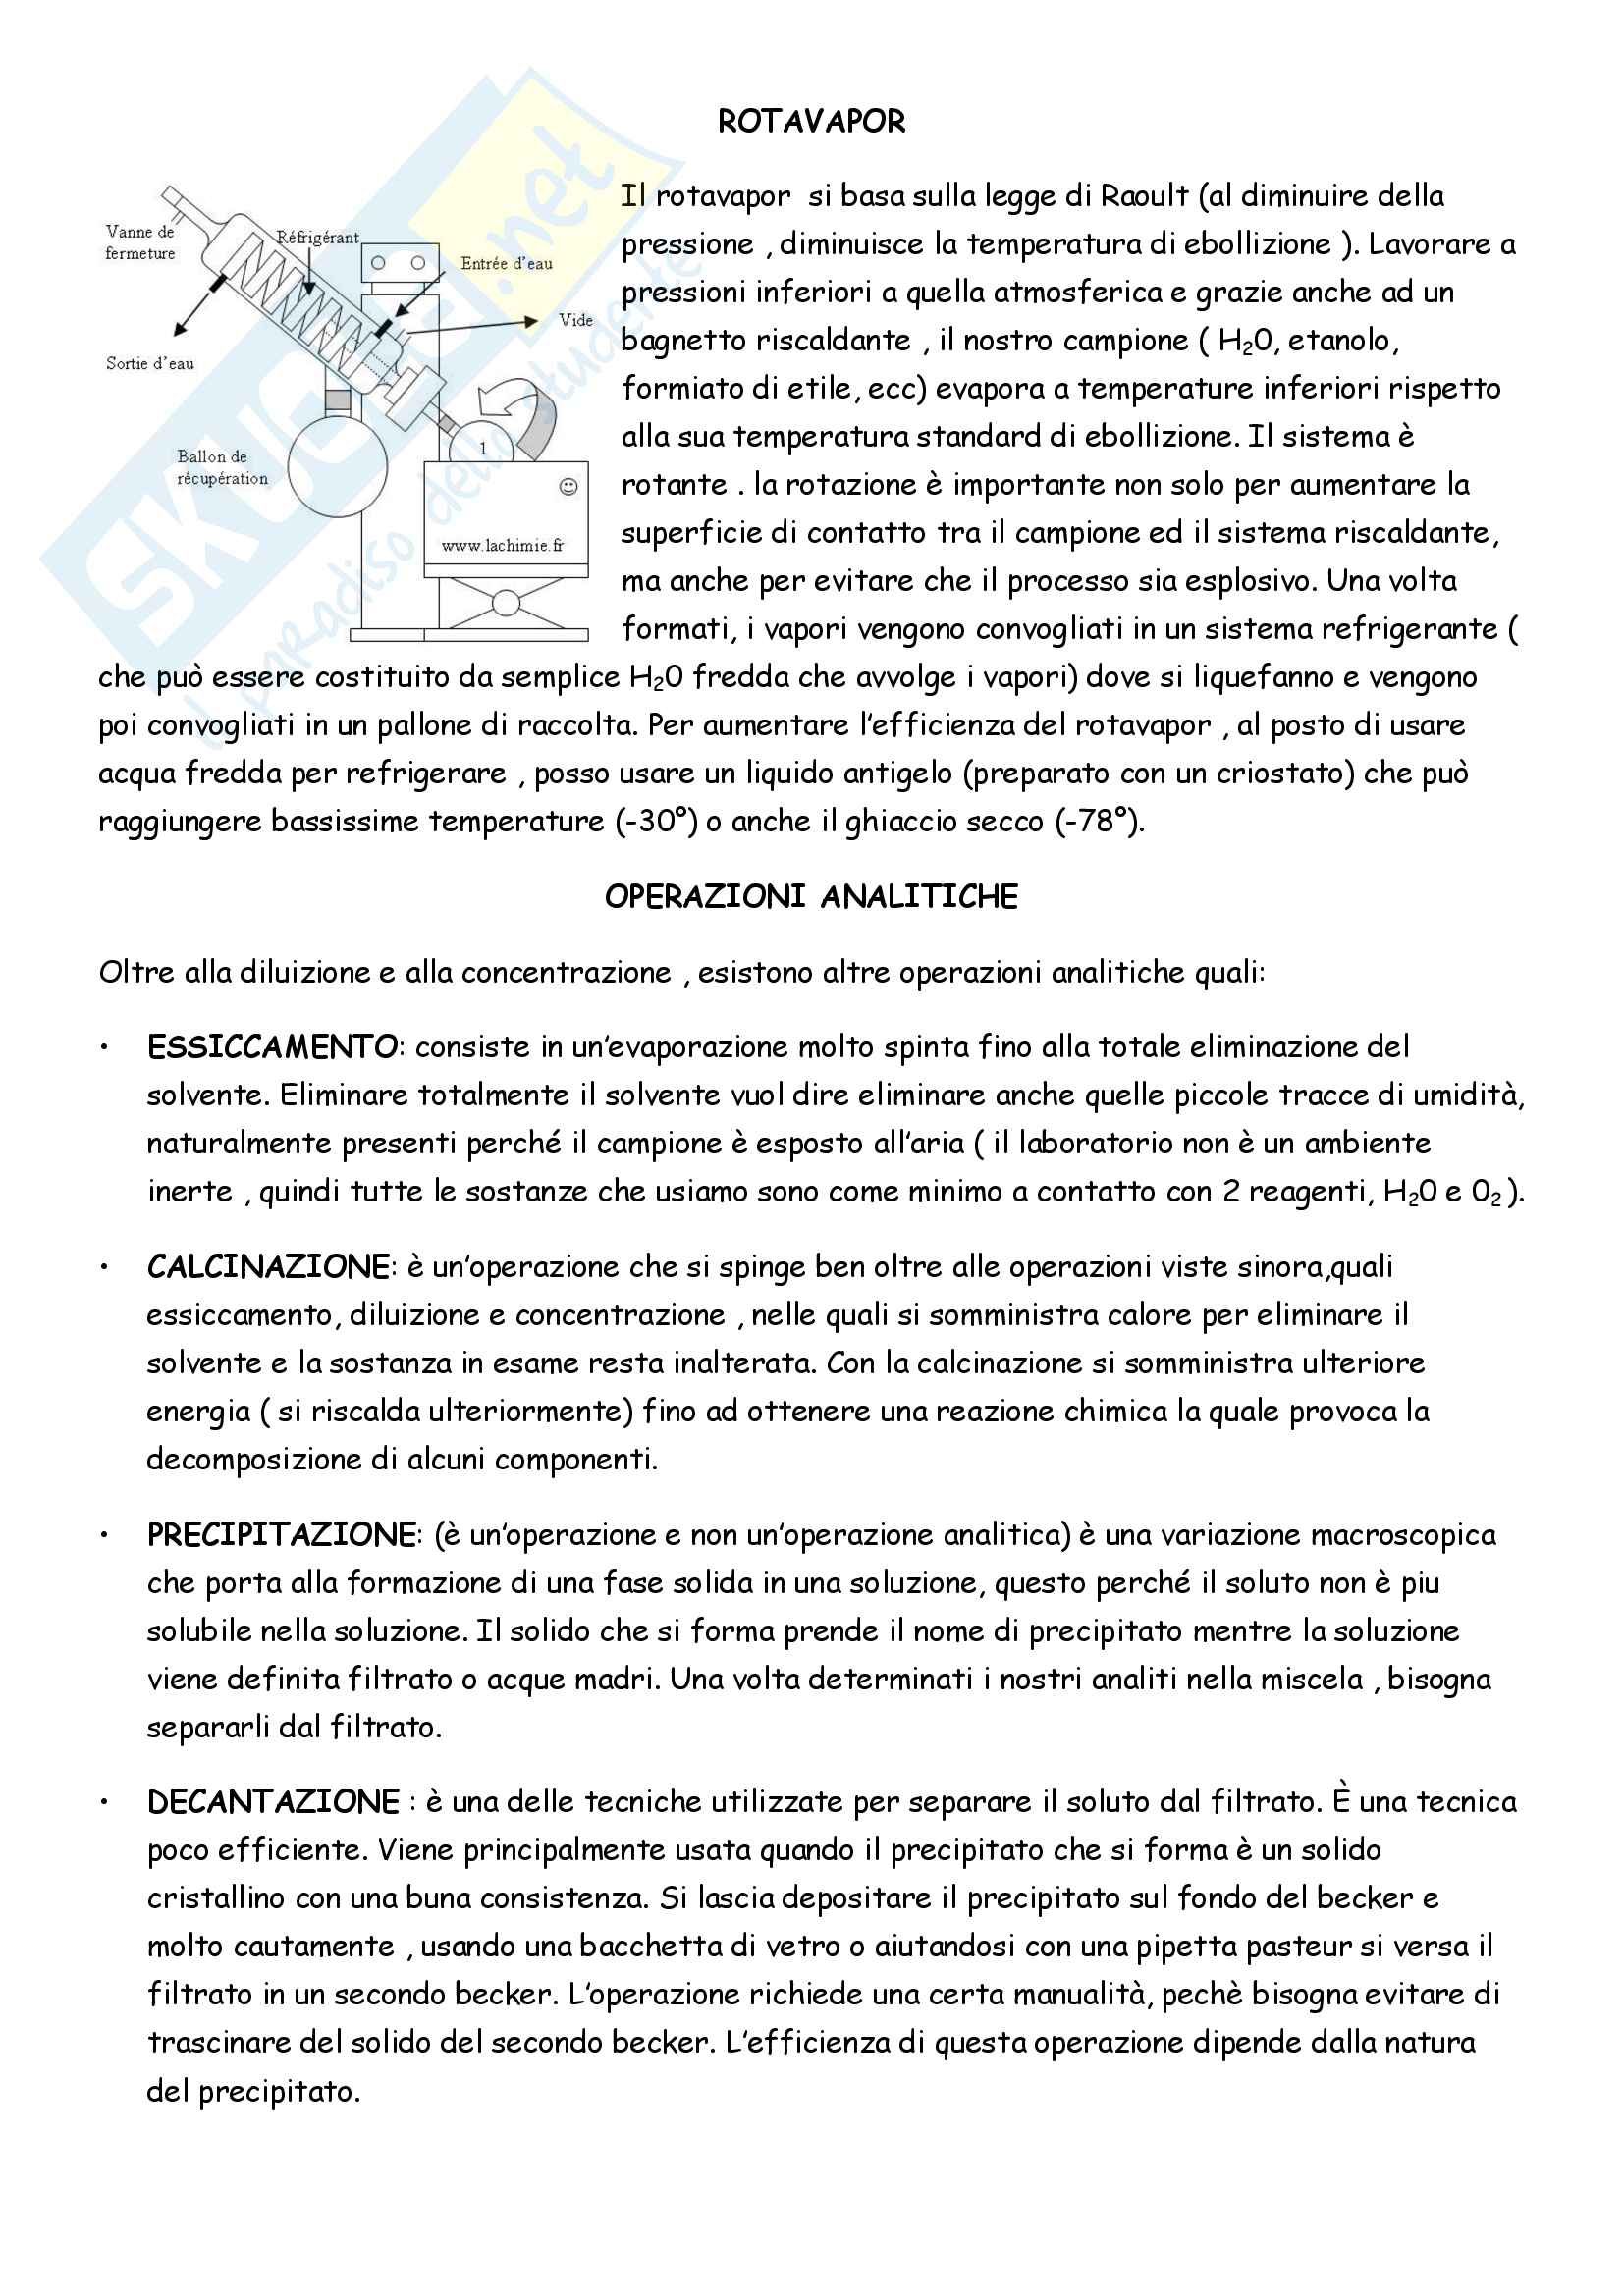 Appunti di Analisi chimico-farmaceutica II